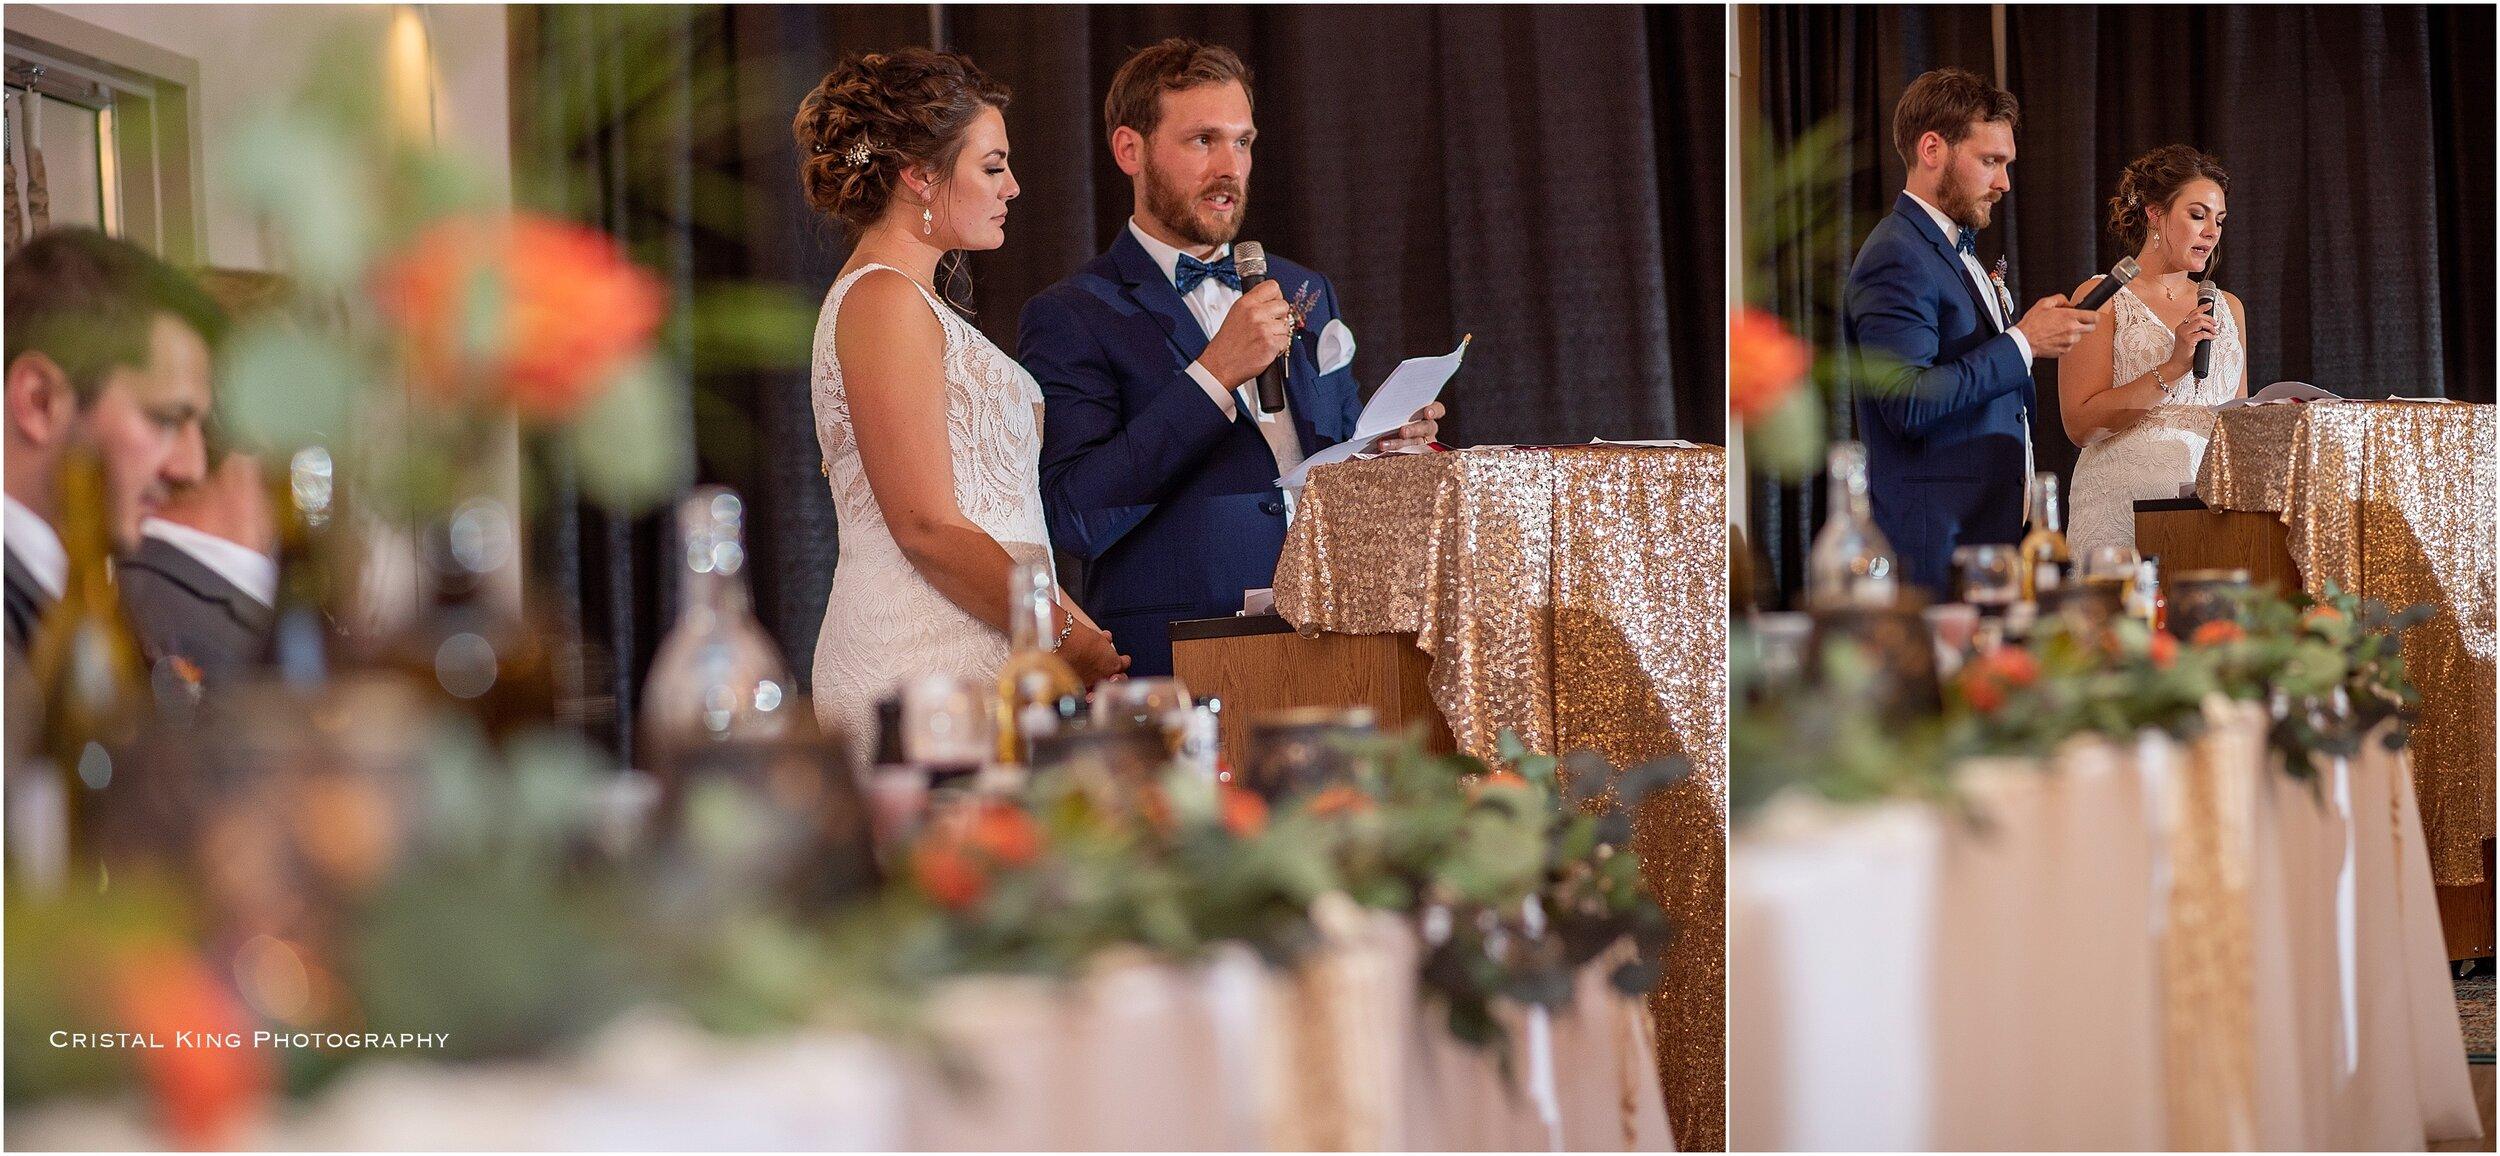 Sarah & Shaun's Wedding-175.jpg